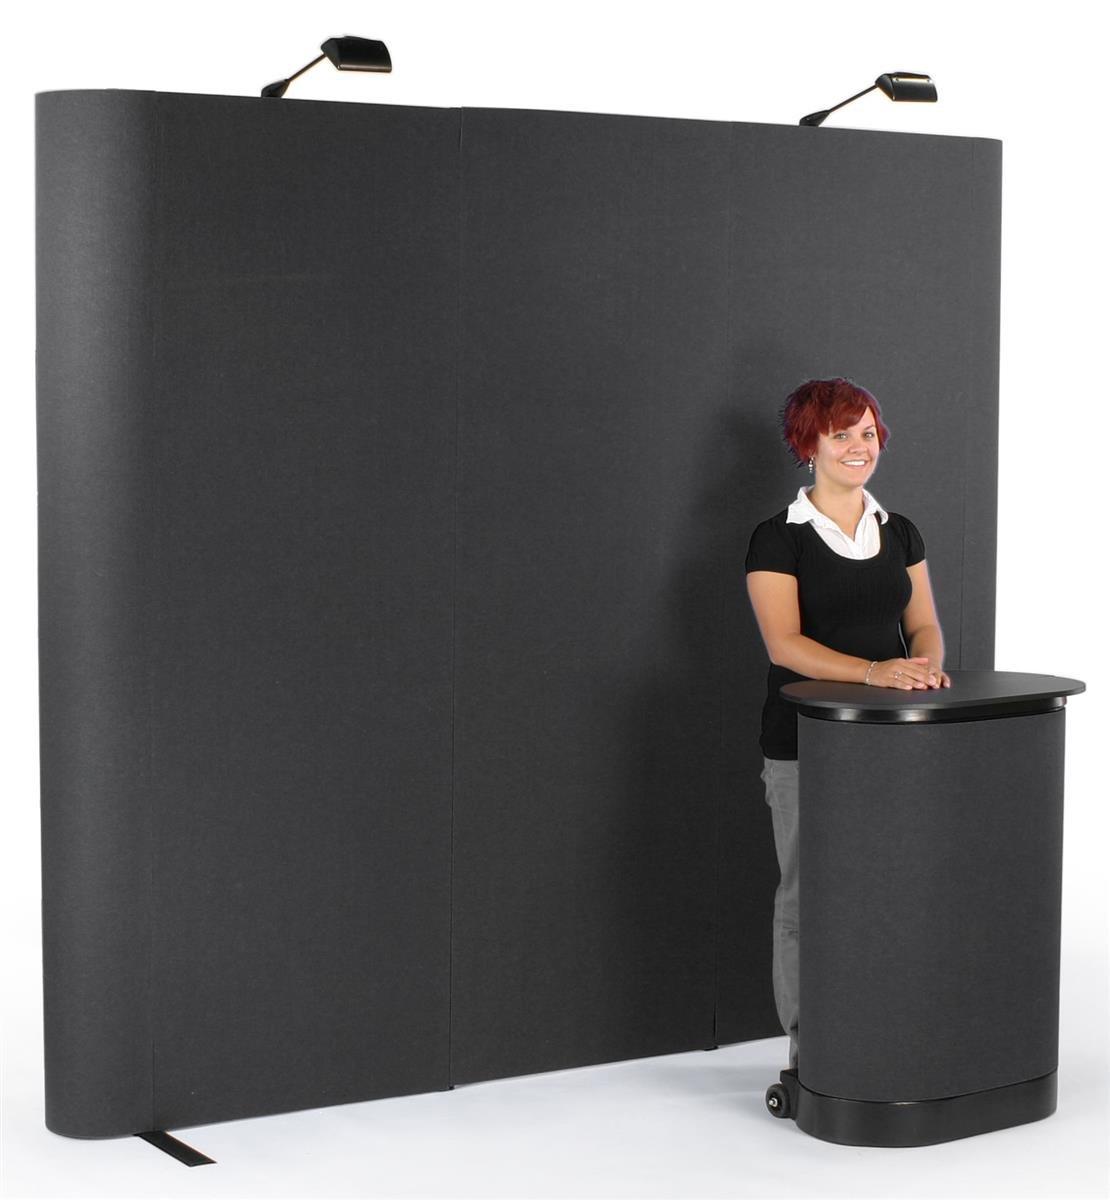 Displays2go Pop Up Display Straight 8-Feet Wall - Black Velcro Receptive Fabric with End Caps (TEPUV8KSE)